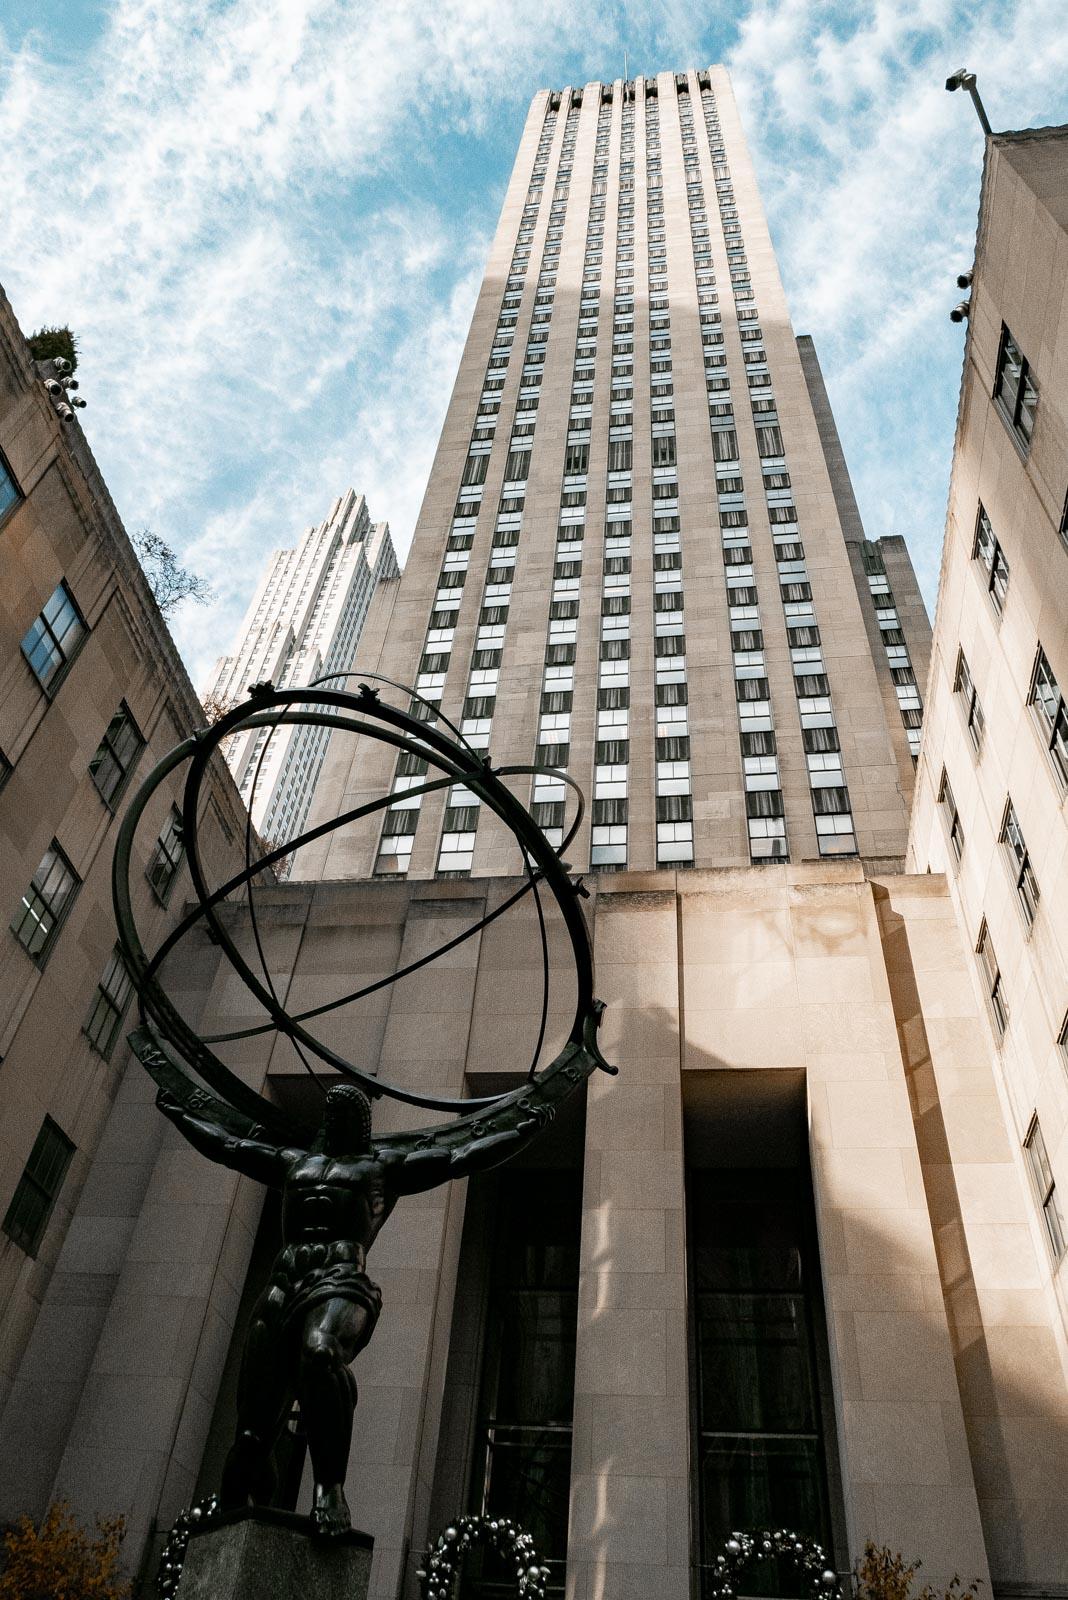 Visiter le Rockefeller Center à New York